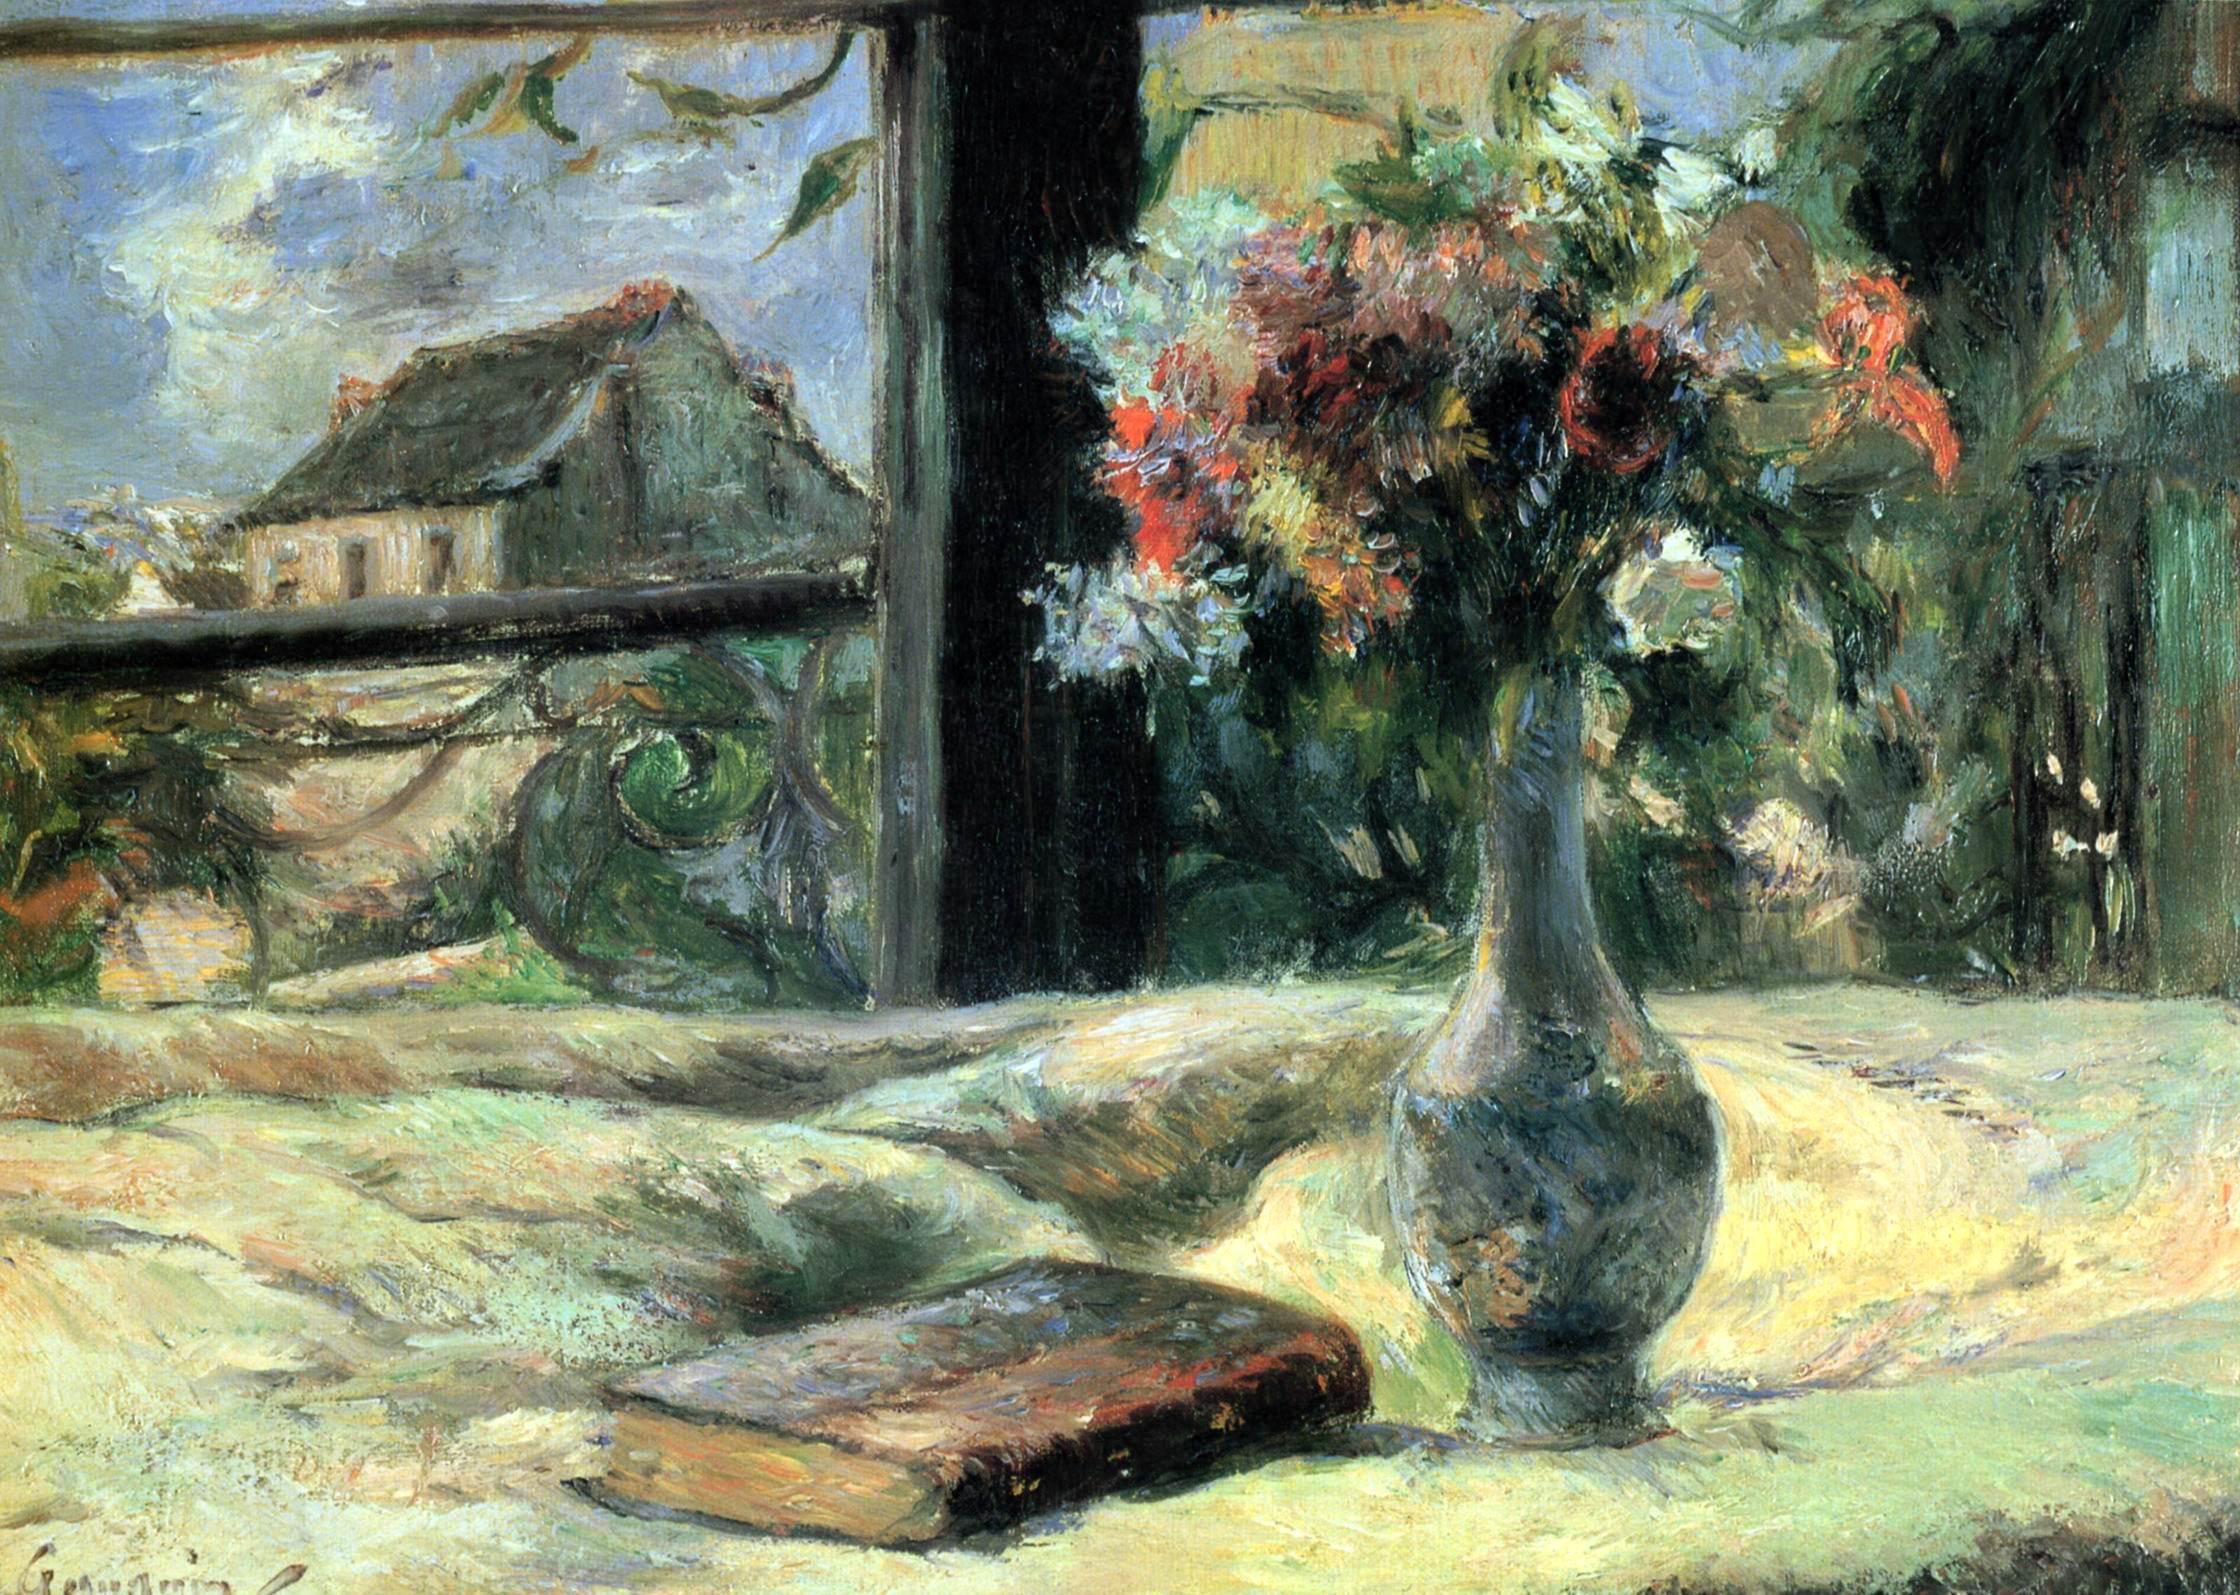 натюрморт  < Ваза с цветами на окне > :: Поль Гоген - Гоген Поль ( Paul Gauguin ) фото